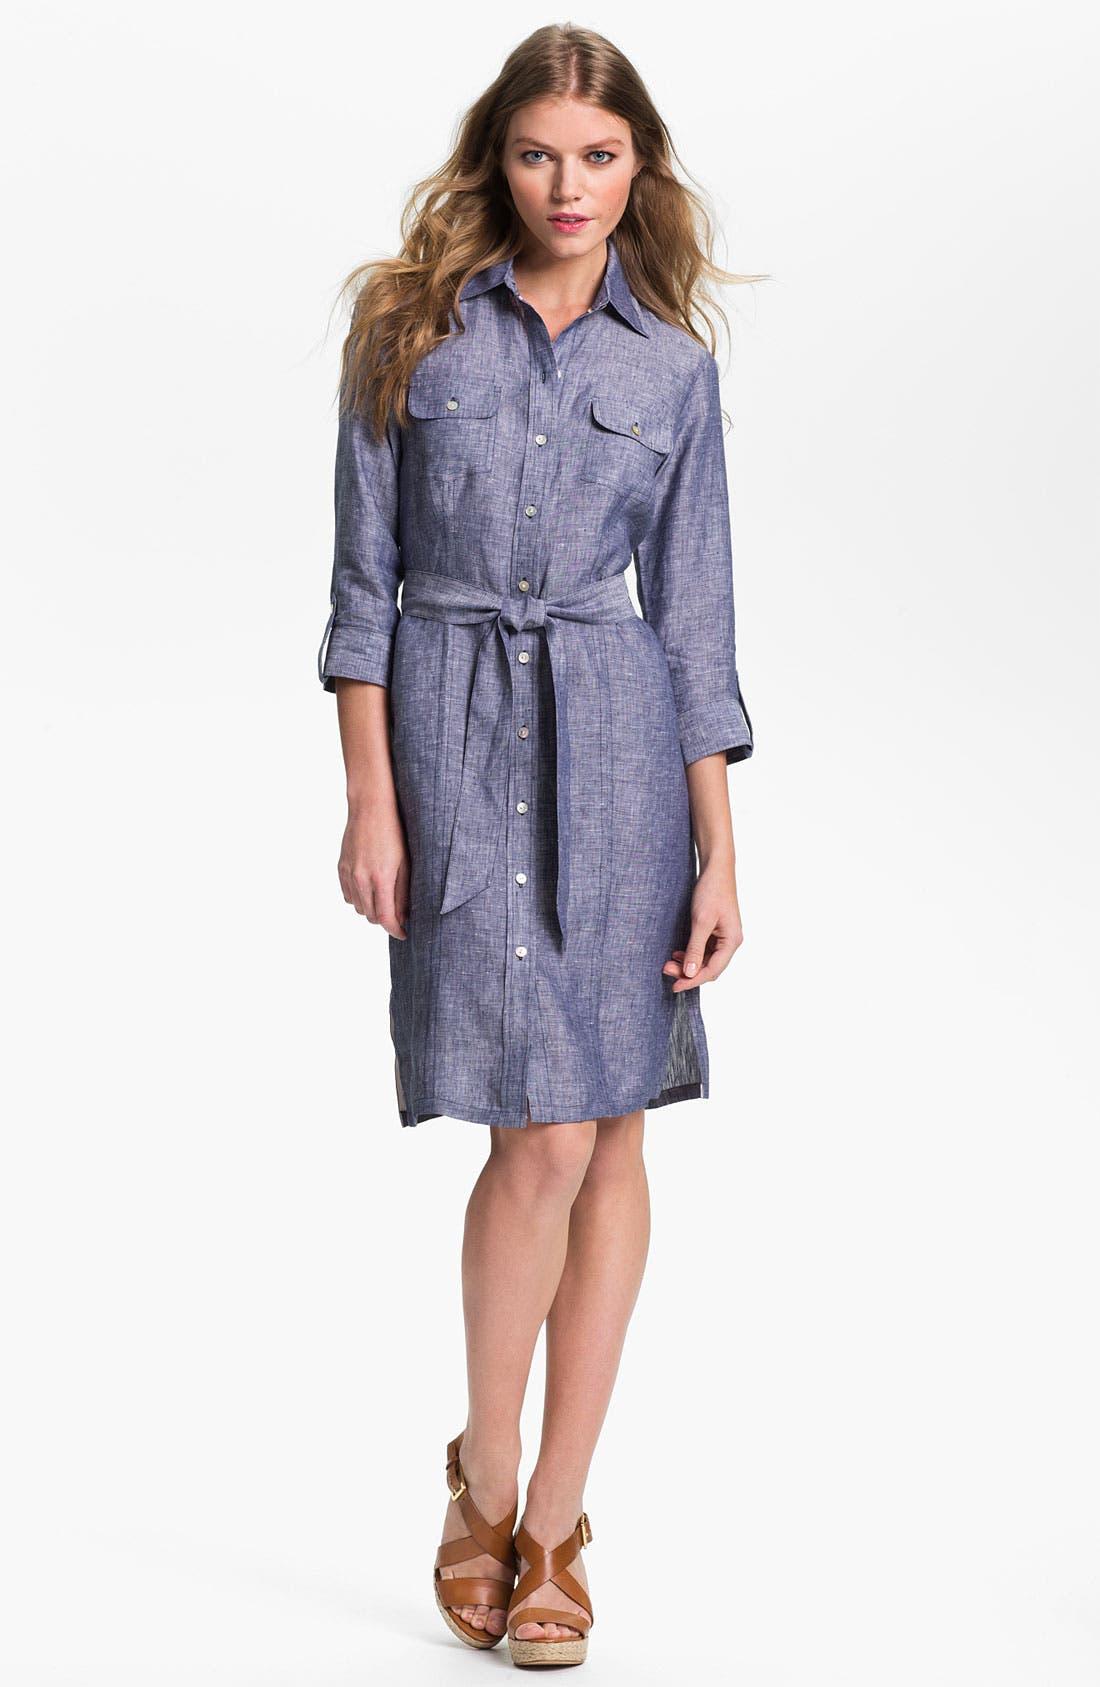 Alternate Image 1 Selected - Foxcroft Chambray Linen Shirtdress